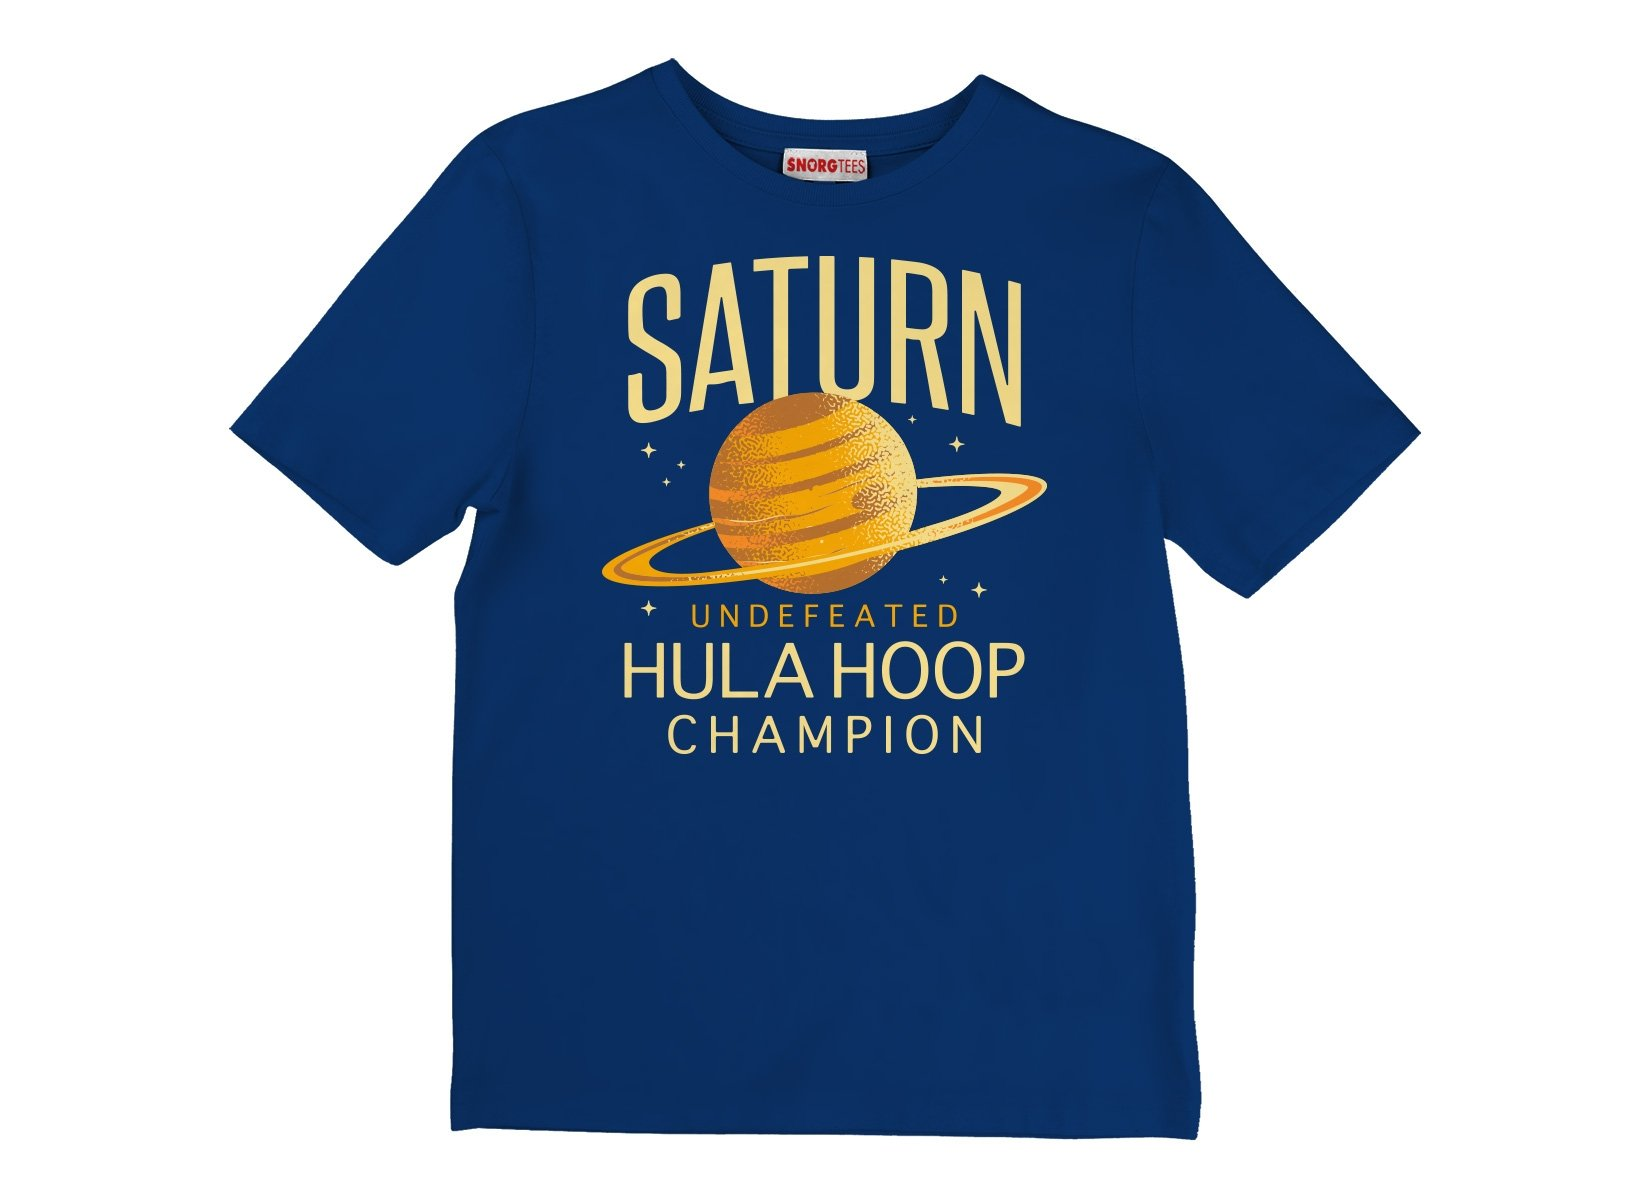 Undefeated Hula Hoop Champion on Kids T-Shirt